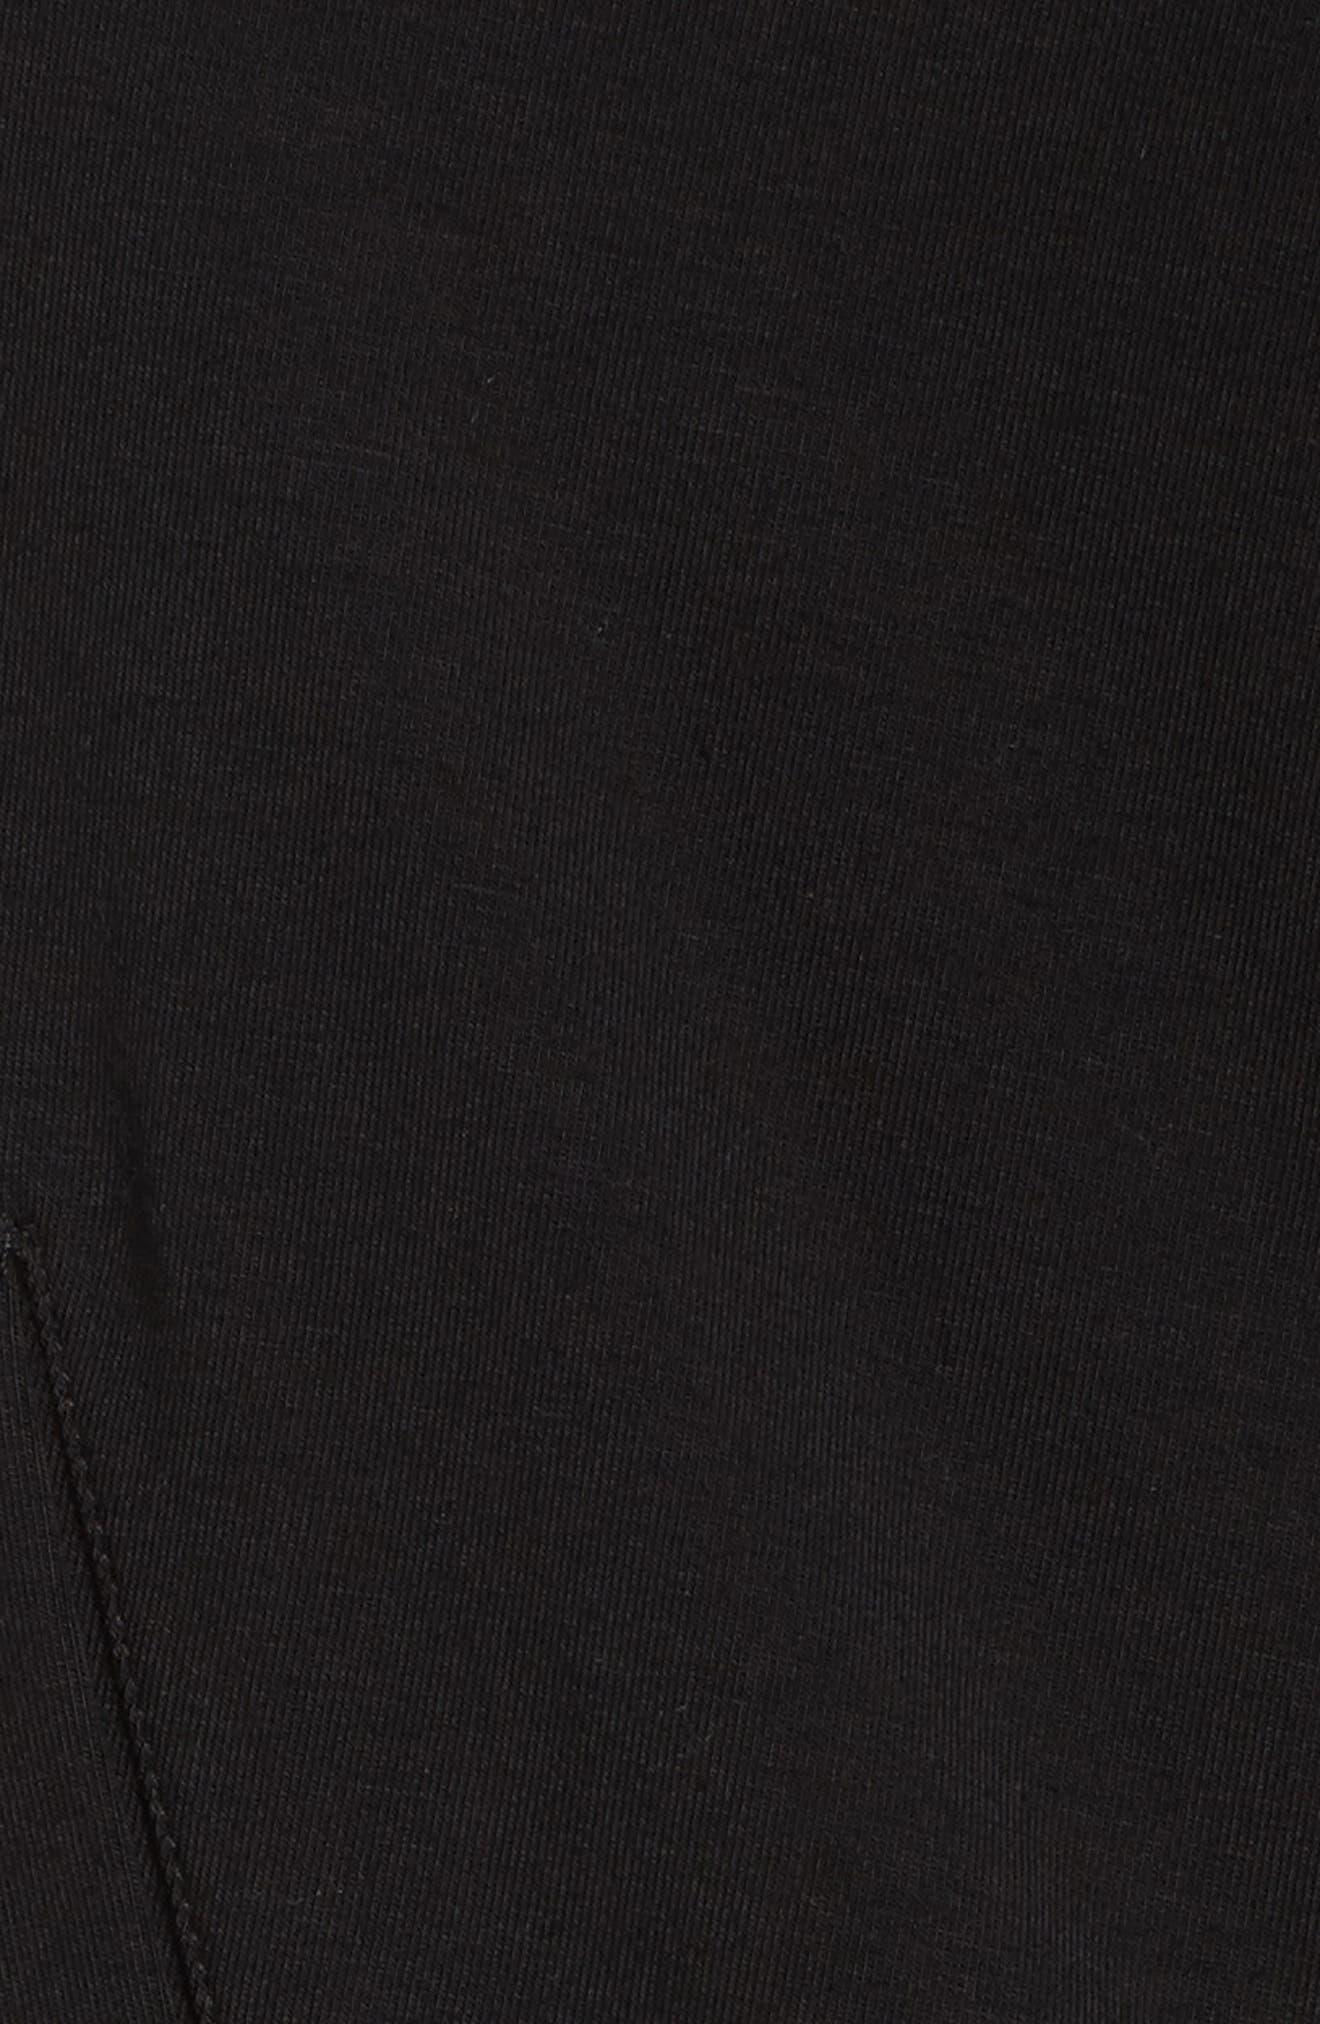 Stretch Organic Cotton Hooded Cardigan,                             Alternate thumbnail 5, color,                             Black